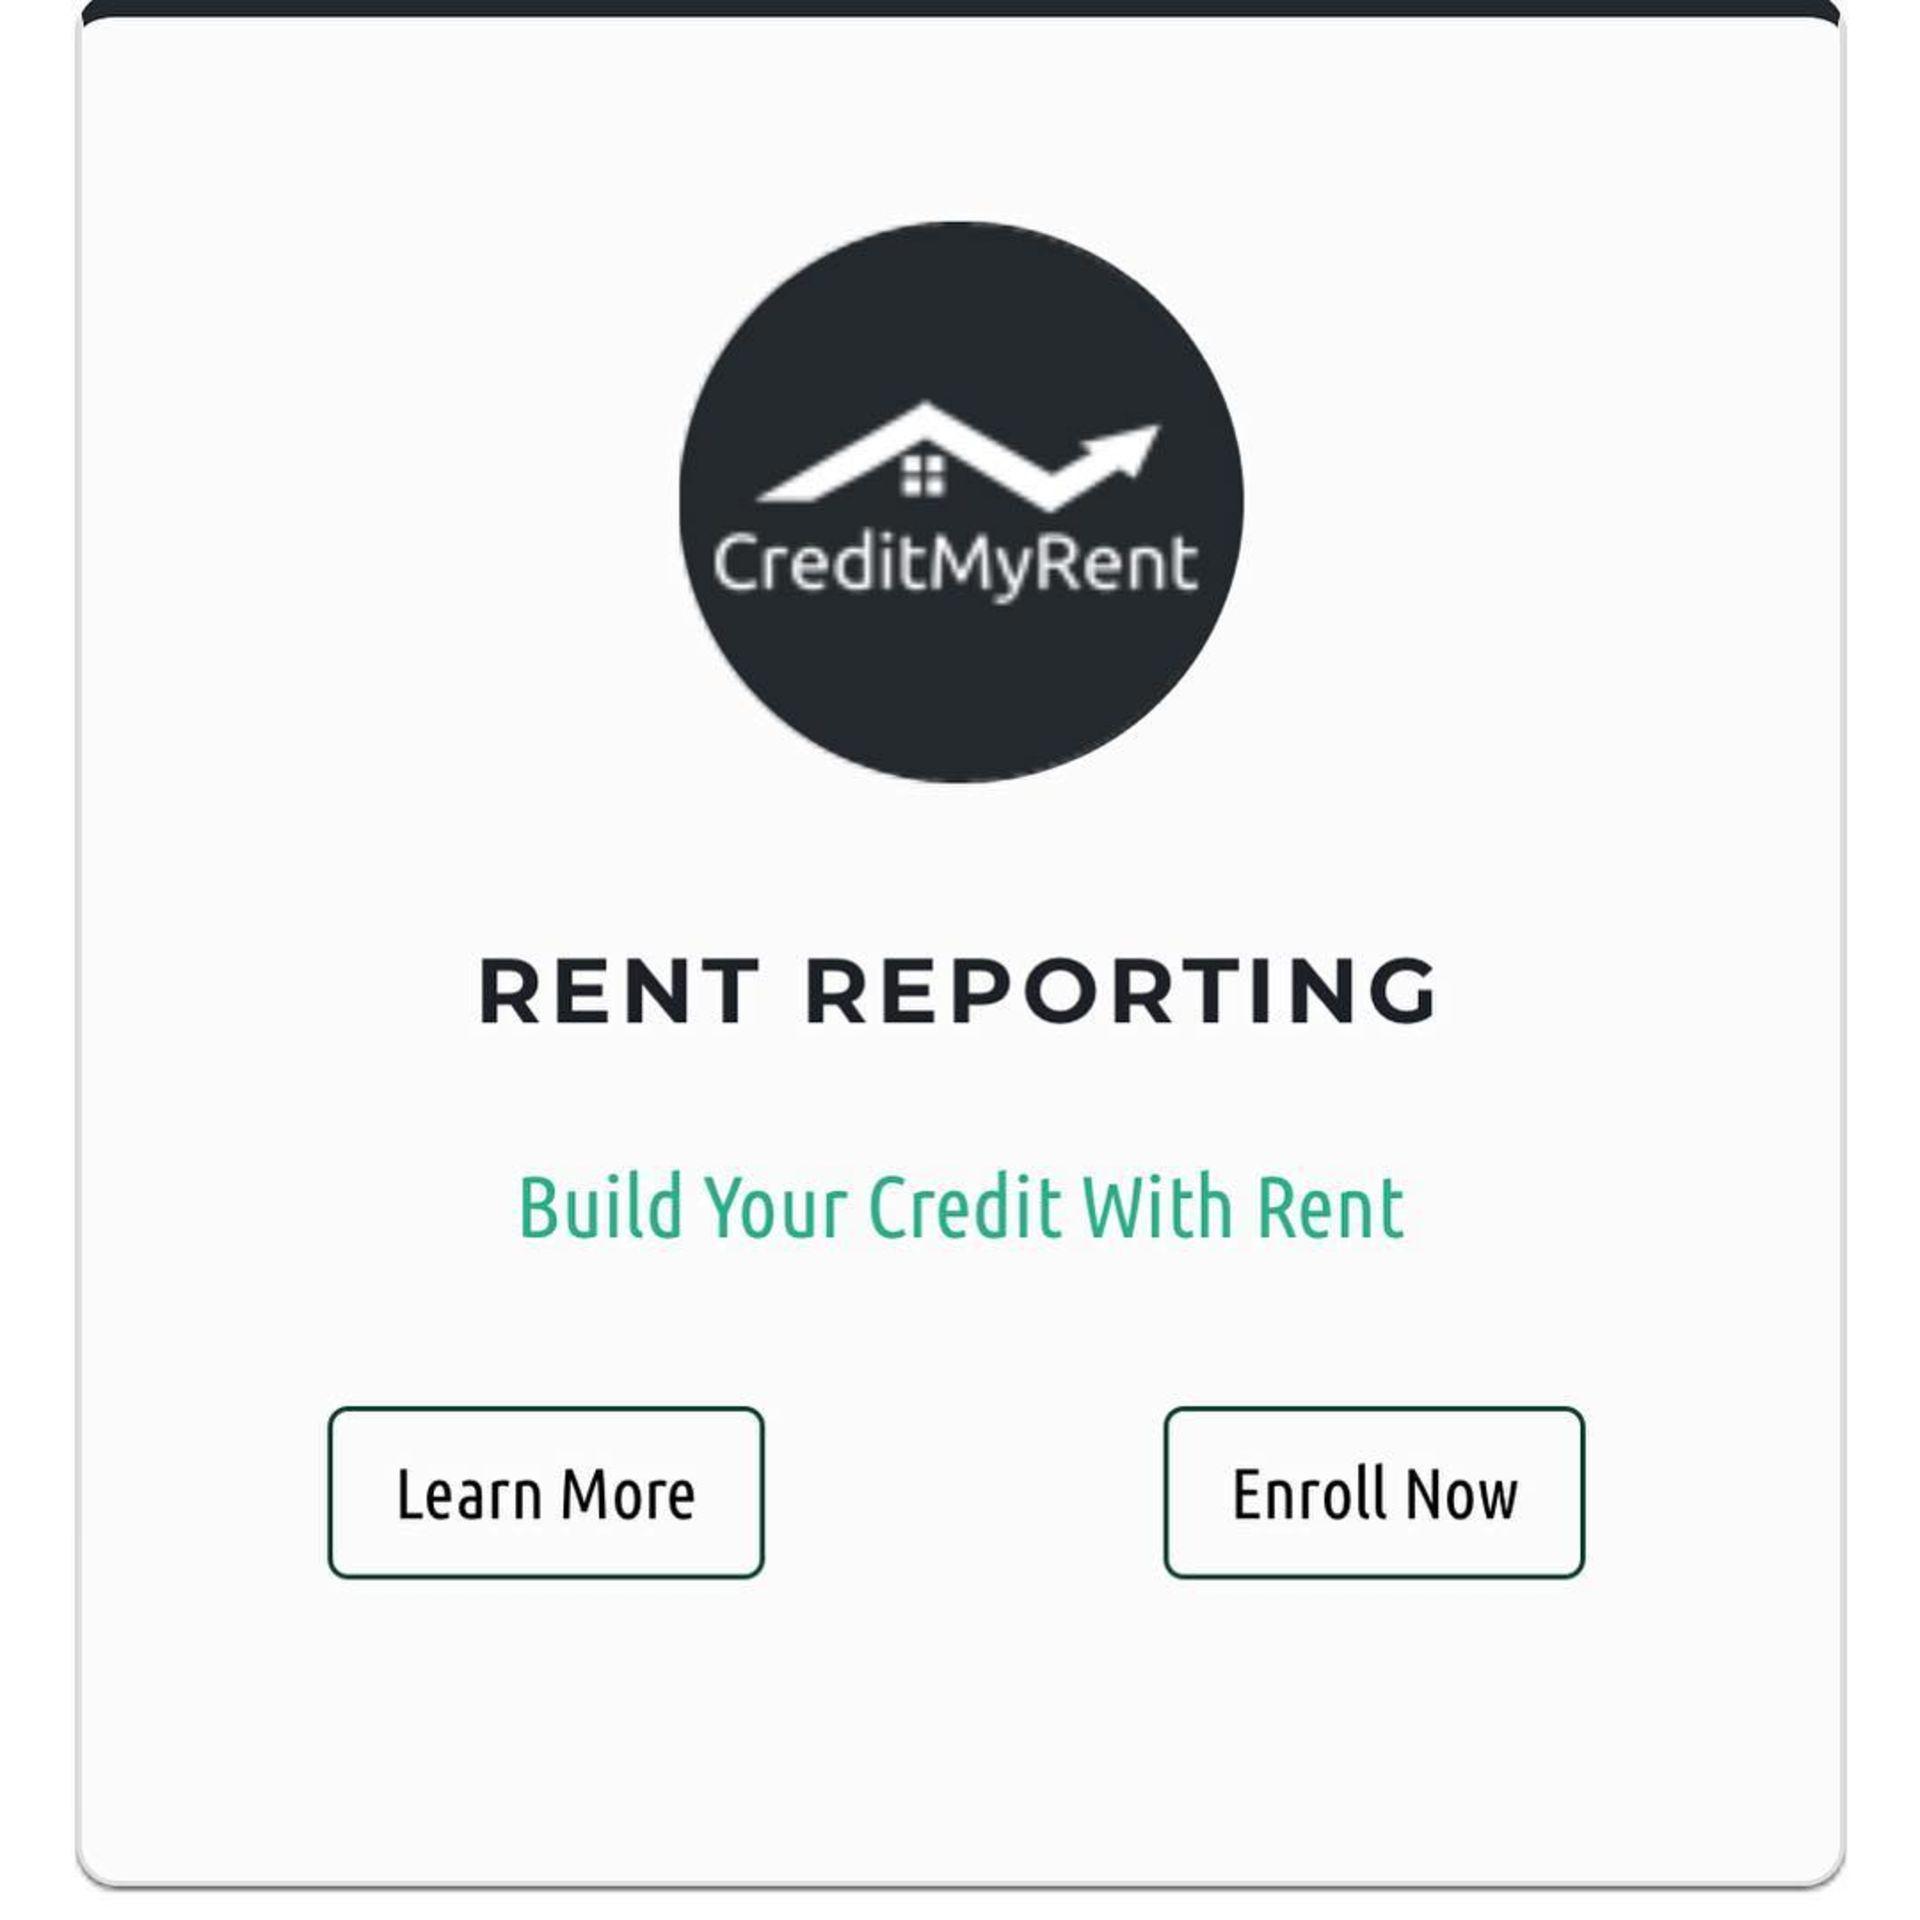 CreditMYRent